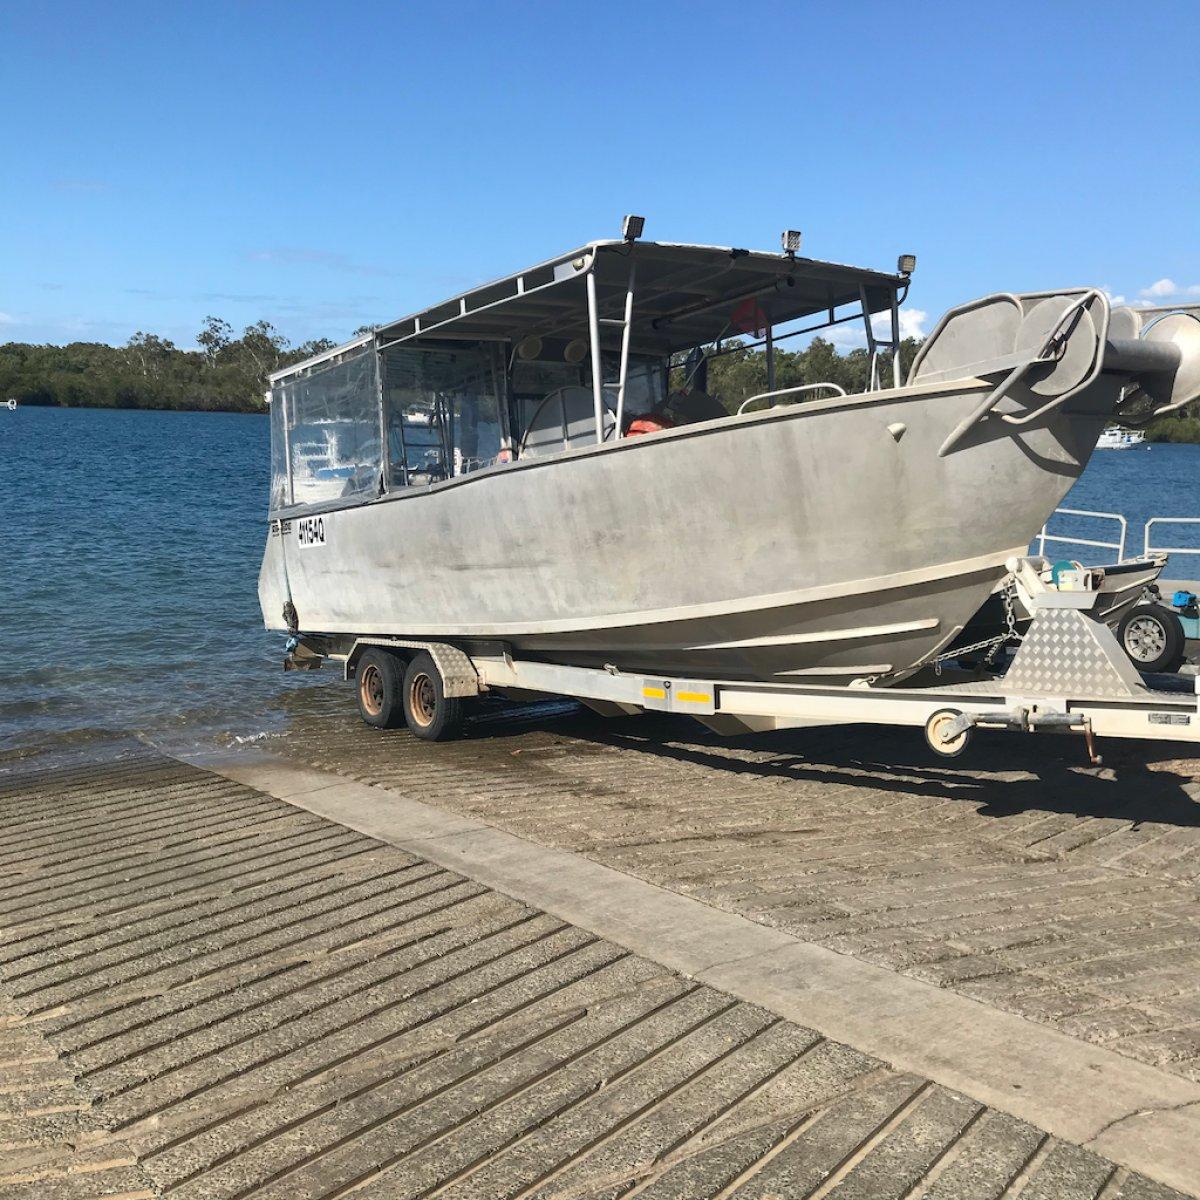 Rip Tide Terrific all rounder classy speedboat